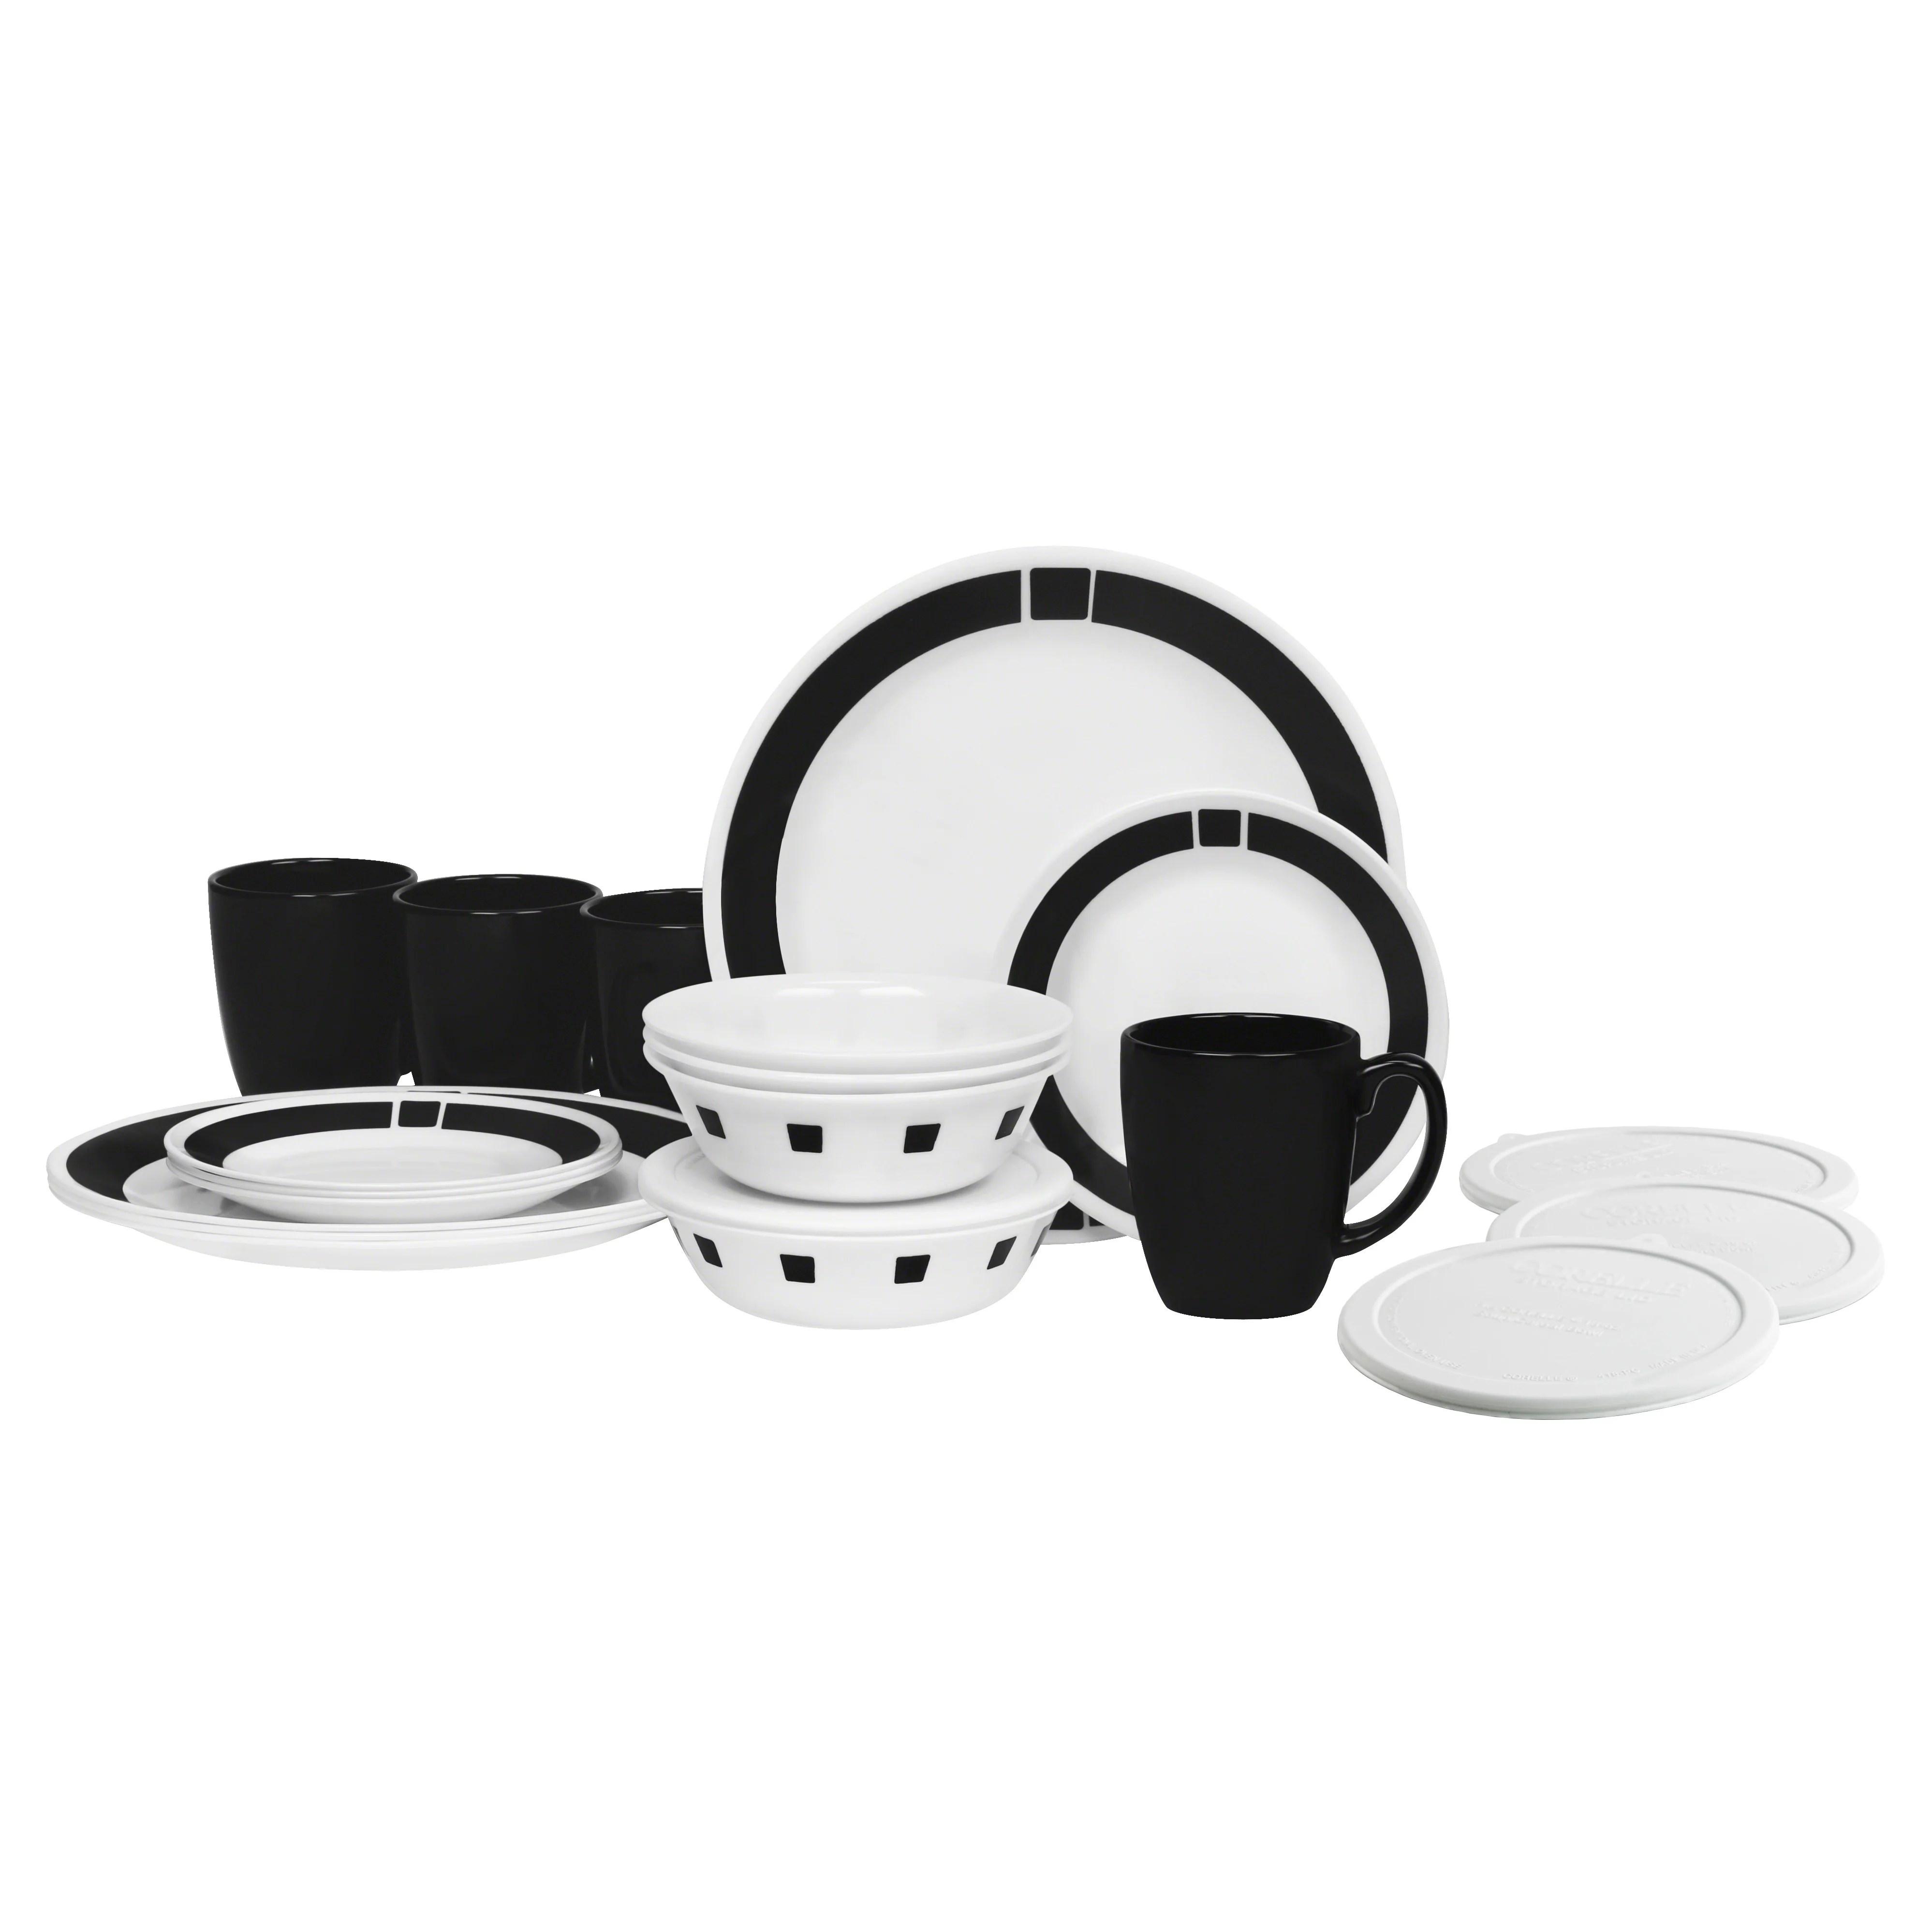 Corelle Livingware Urban Black 20 Piece Dinnerware Set